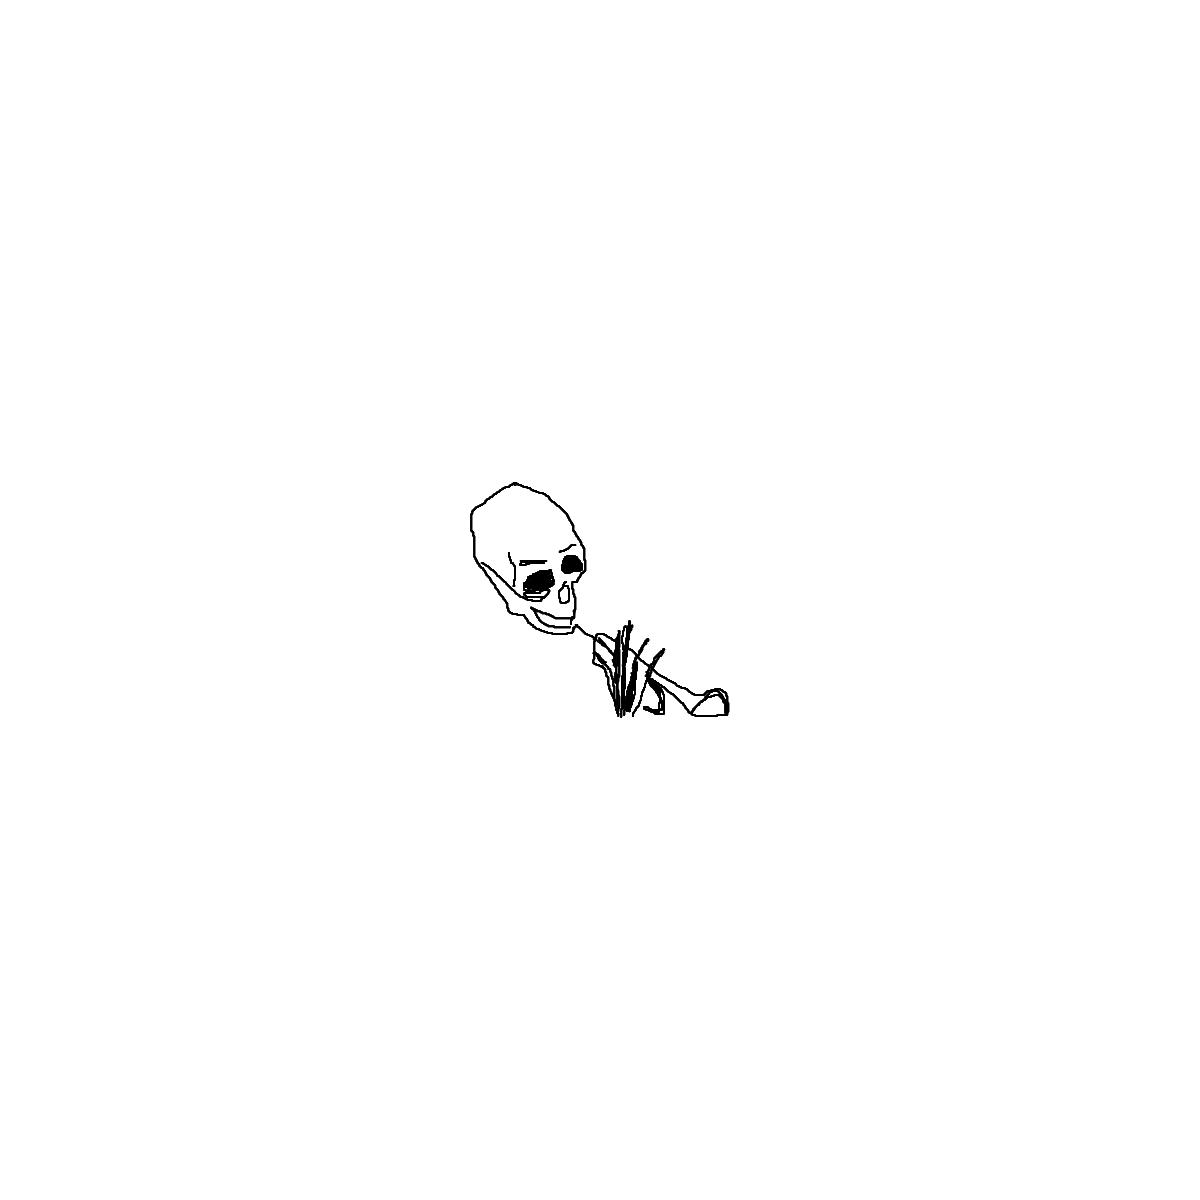 BAAAM drawing#16027 lat:53.0254707336425800lng: -122.5781784057617200